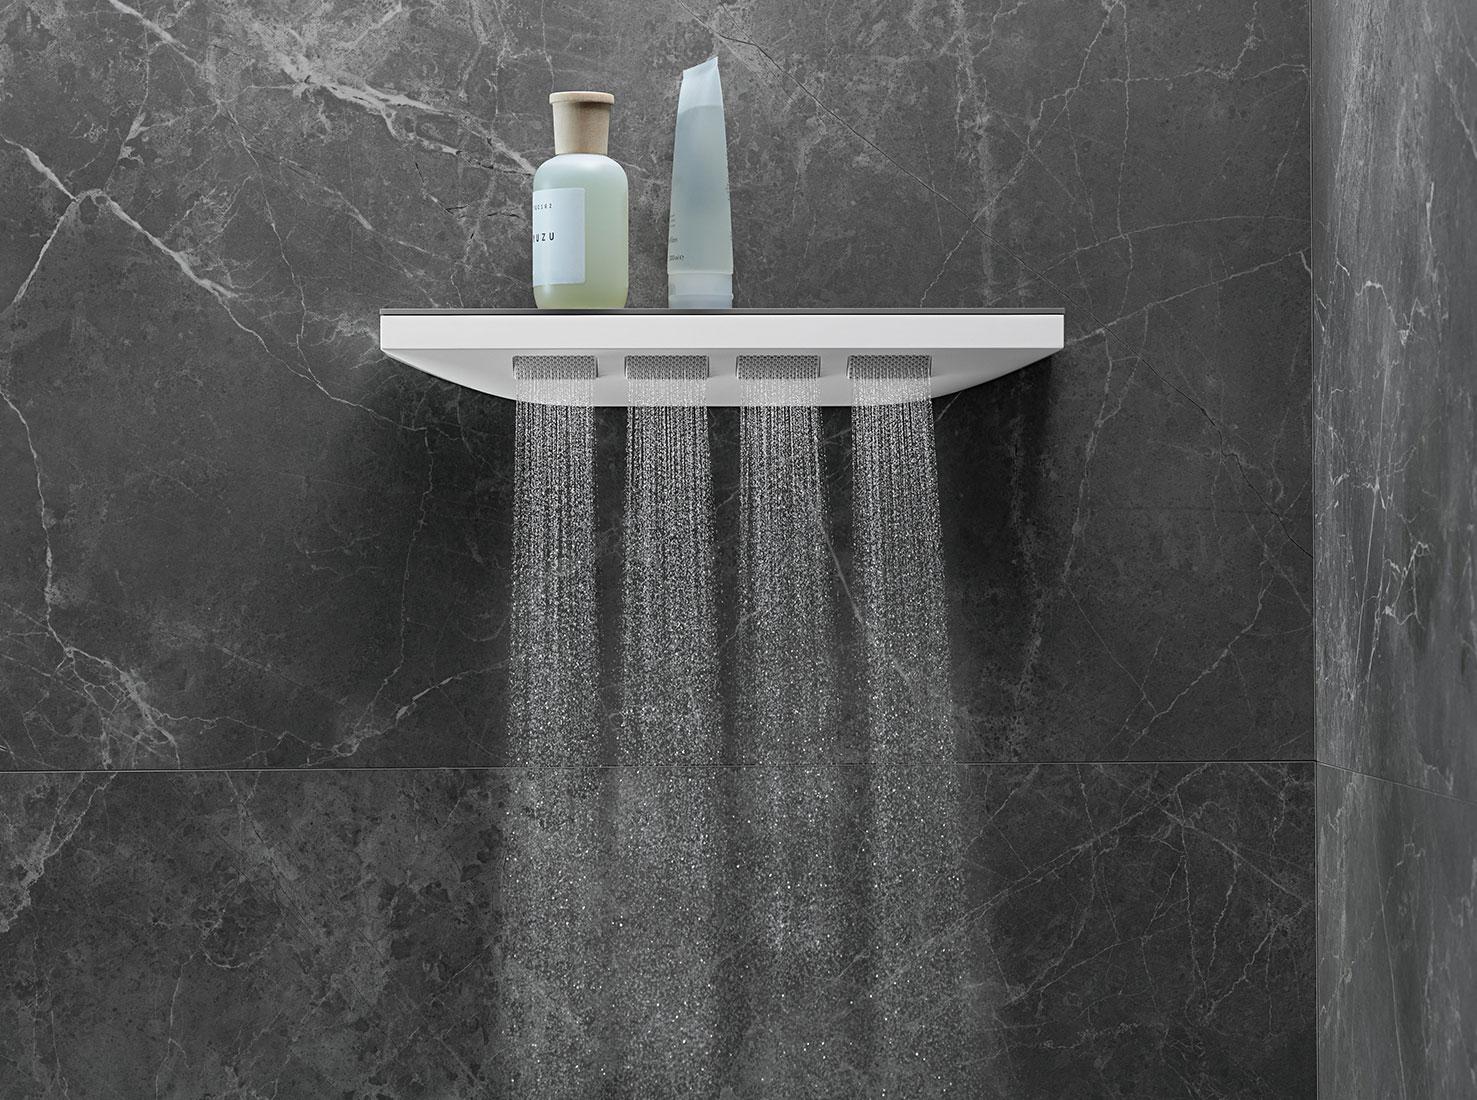 душ Rainfinity фото